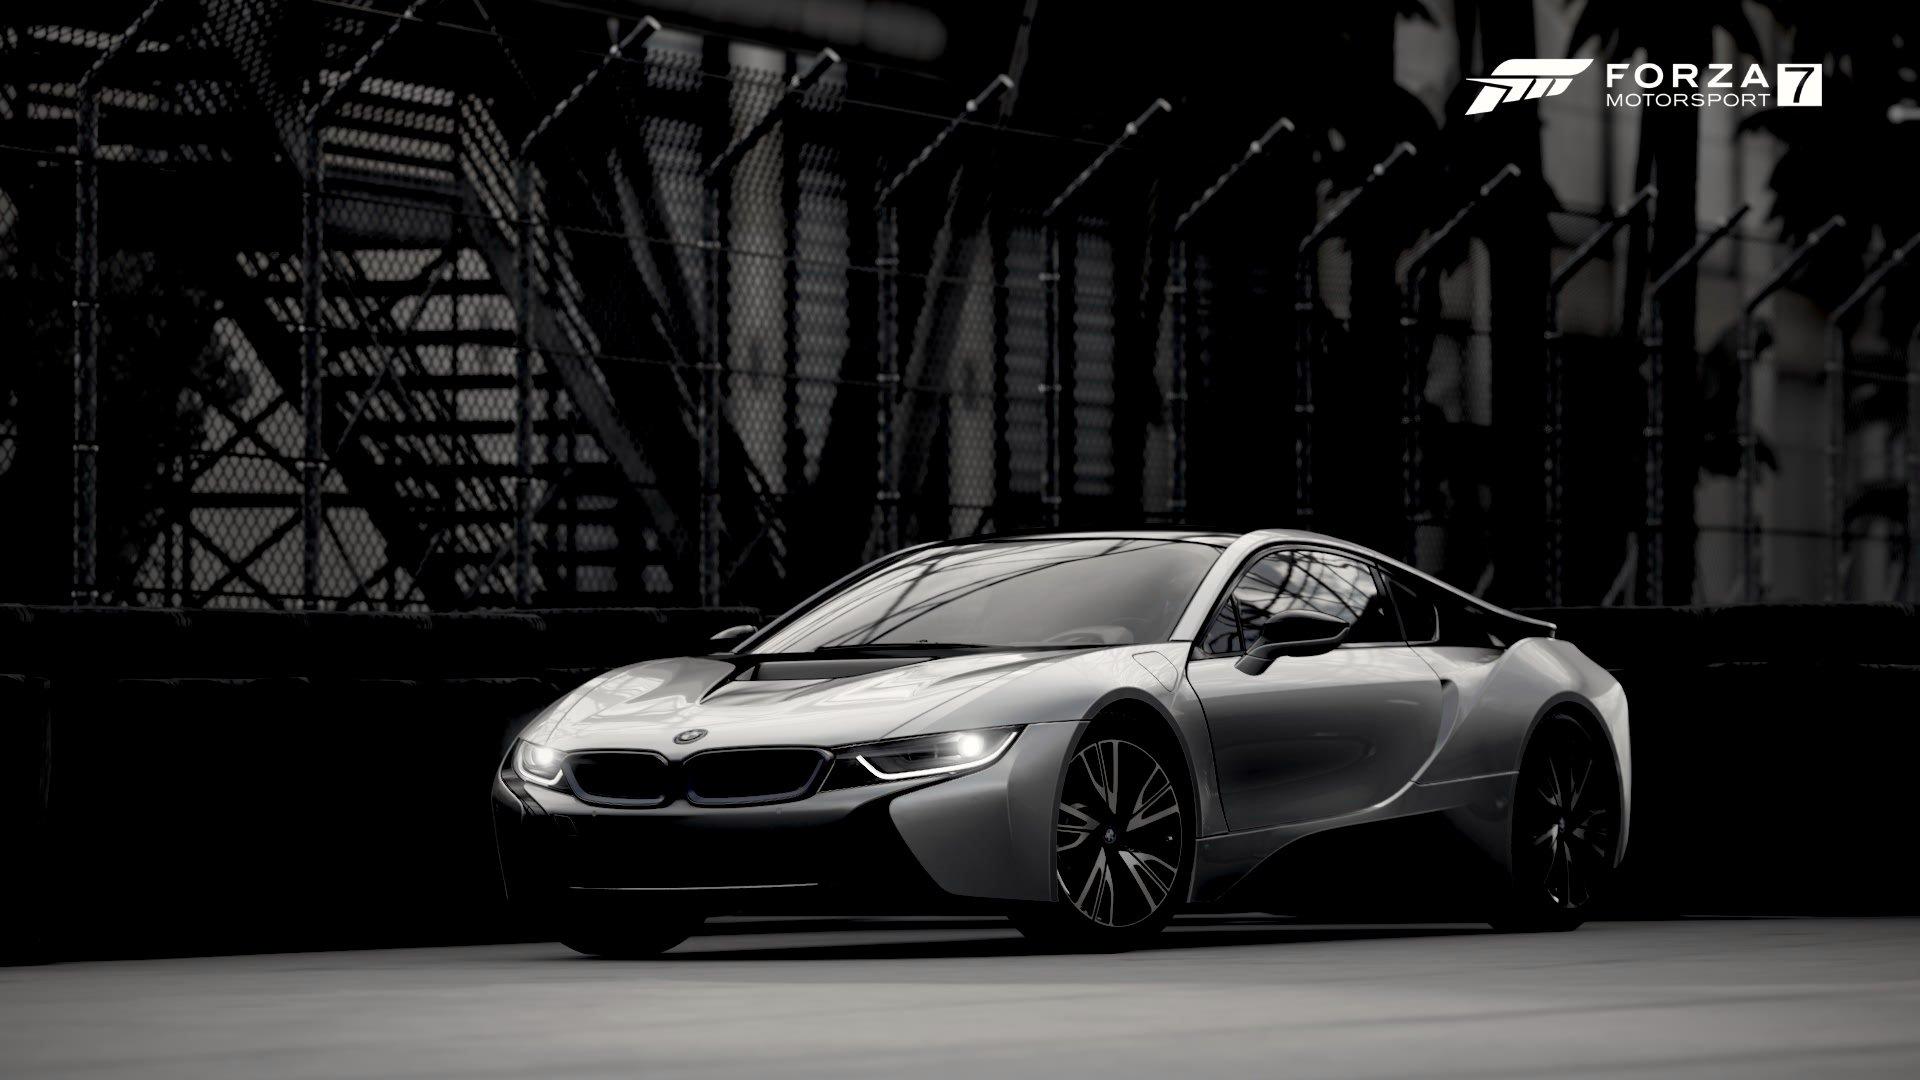 25141951517_8fcd4b999e_o ForzaMotorsport.fr